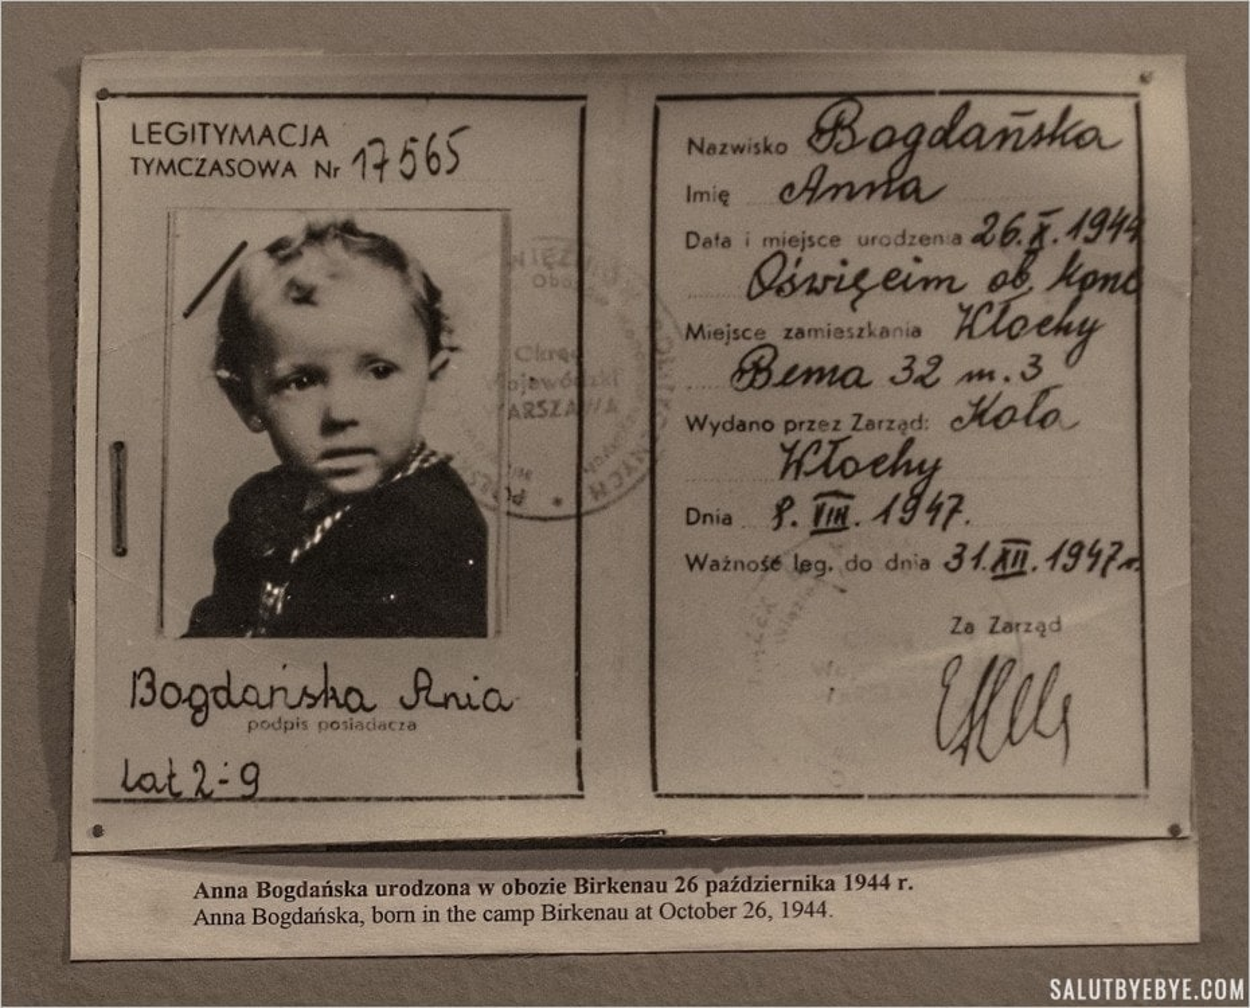 Ania Bogdanska, née le 26 octobre 1944 à Birkenau